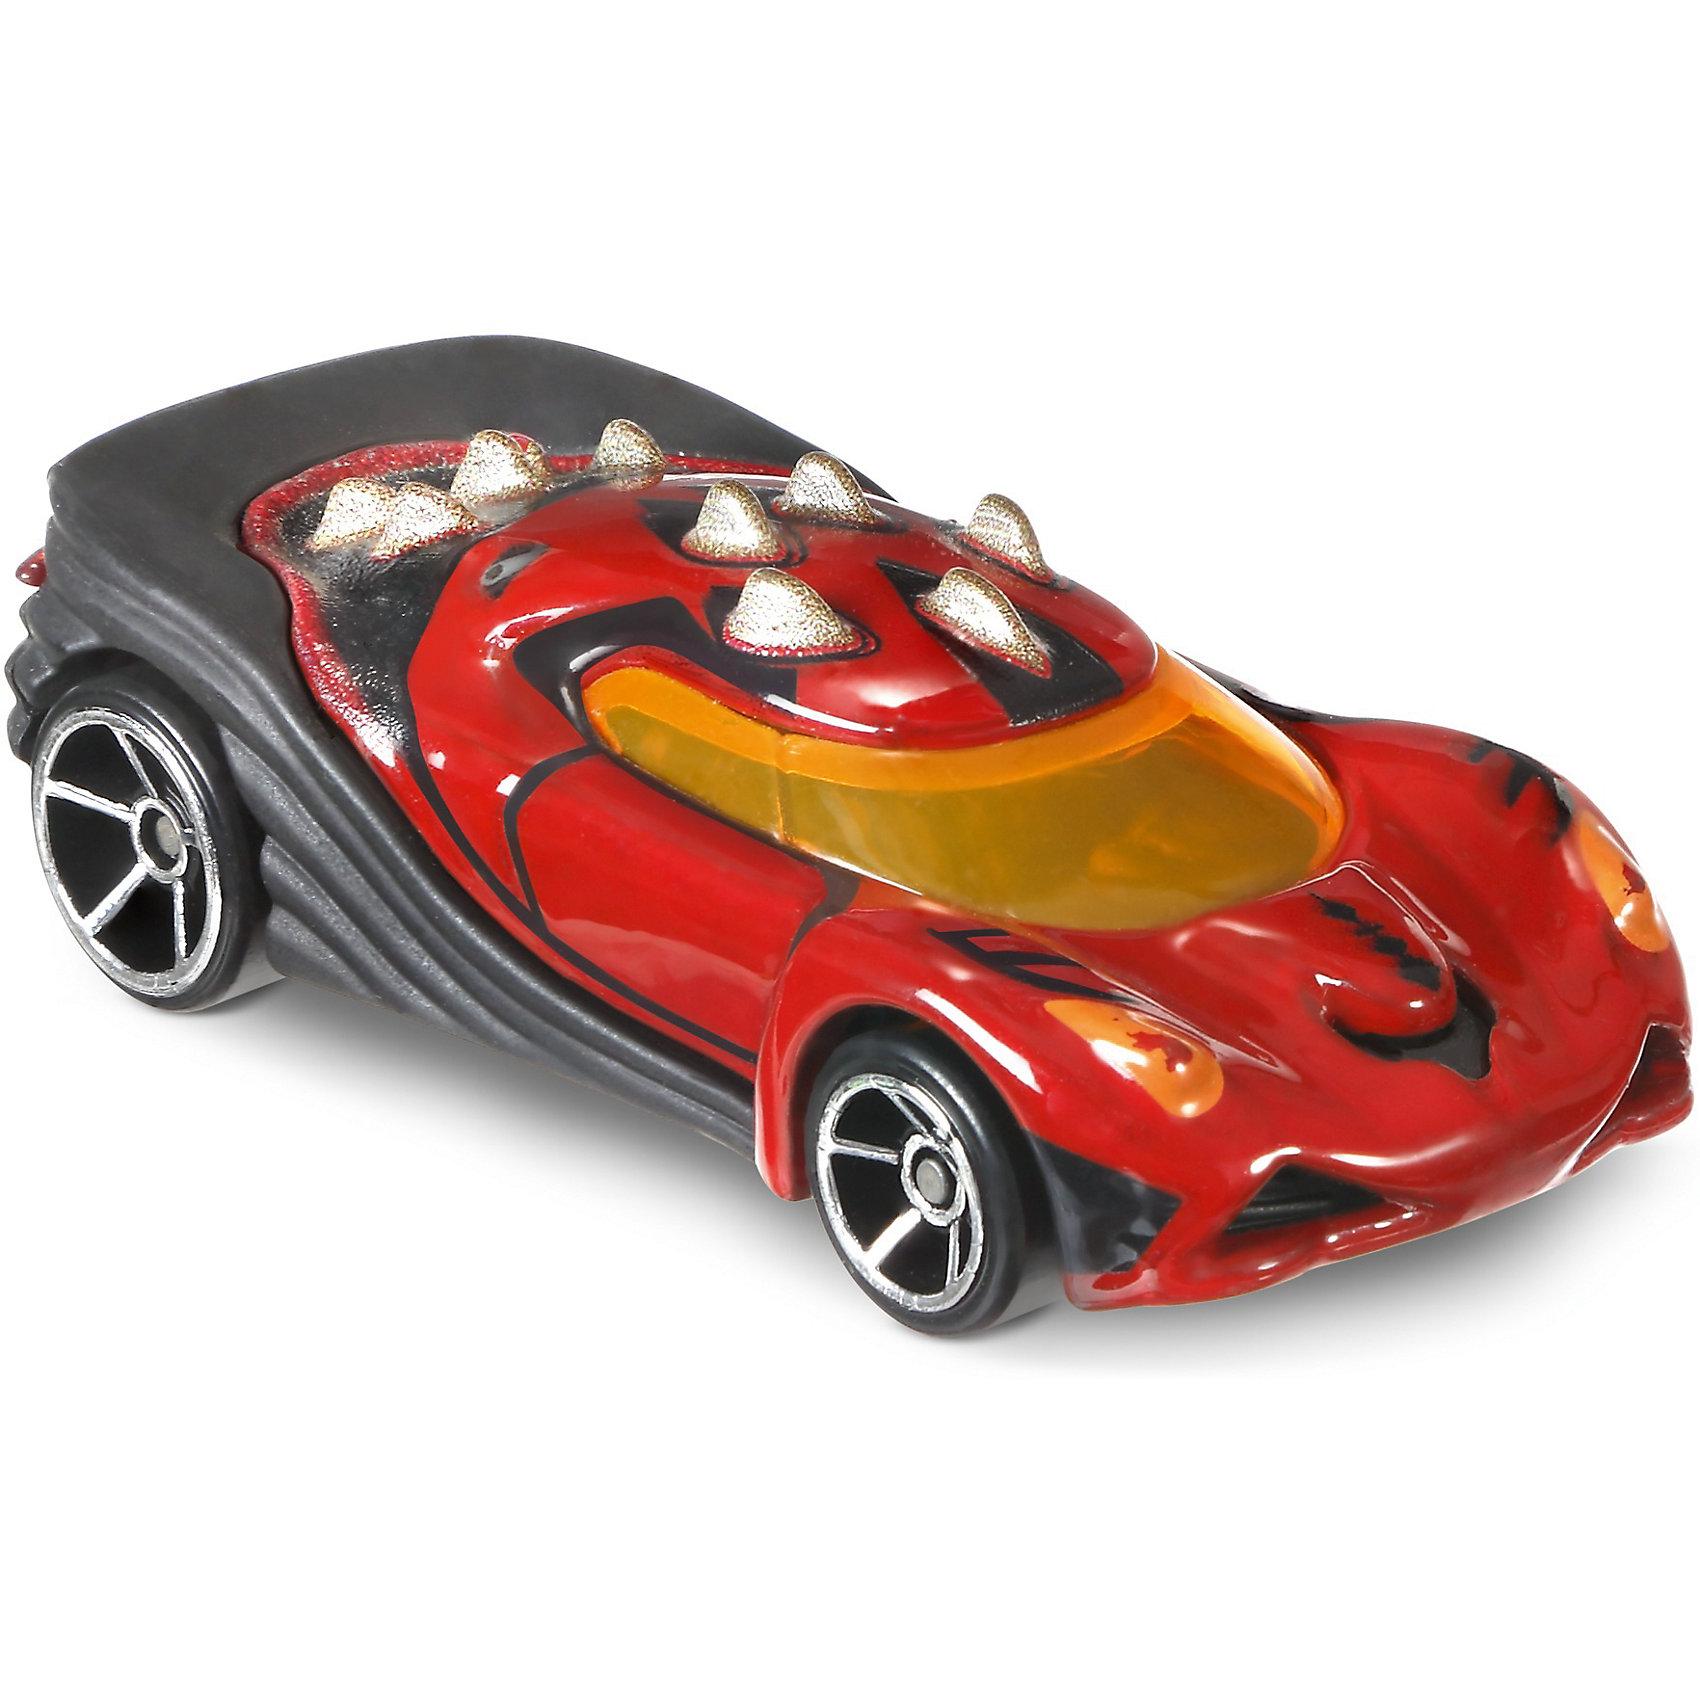 Машинка Darth Maul SW, Hot WheelsПопулярные игрушки<br><br><br>Ширина мм: 140<br>Глубина мм: 40<br>Высота мм: 165<br>Вес г: 91<br>Возраст от месяцев: 36<br>Возраст до месяцев: 72<br>Пол: Мужской<br>Возраст: Детский<br>SKU: 5440268